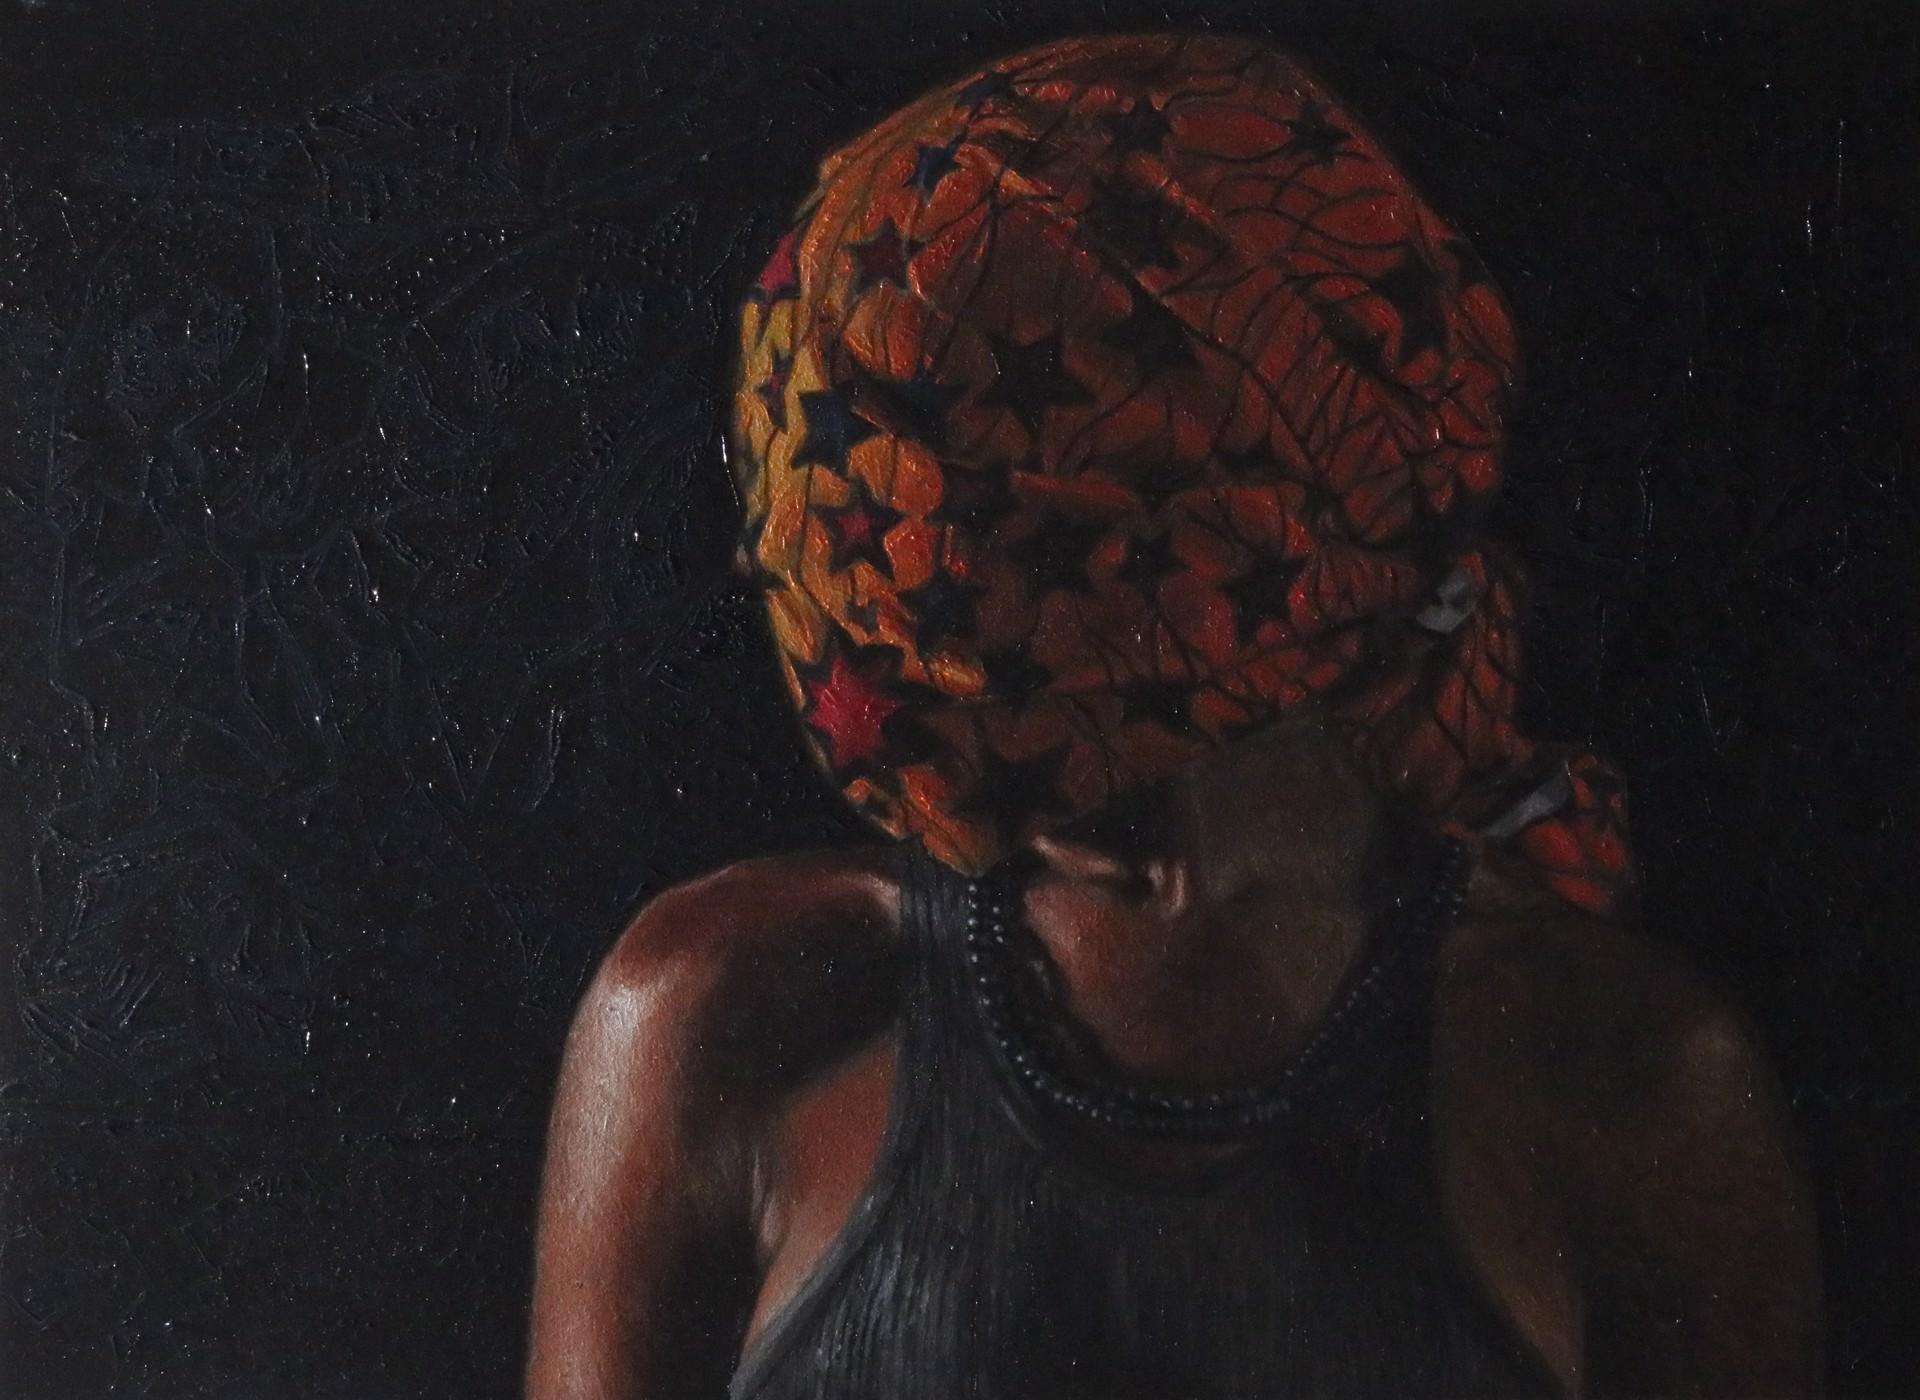 Abeni by Idowu Oluwaseun